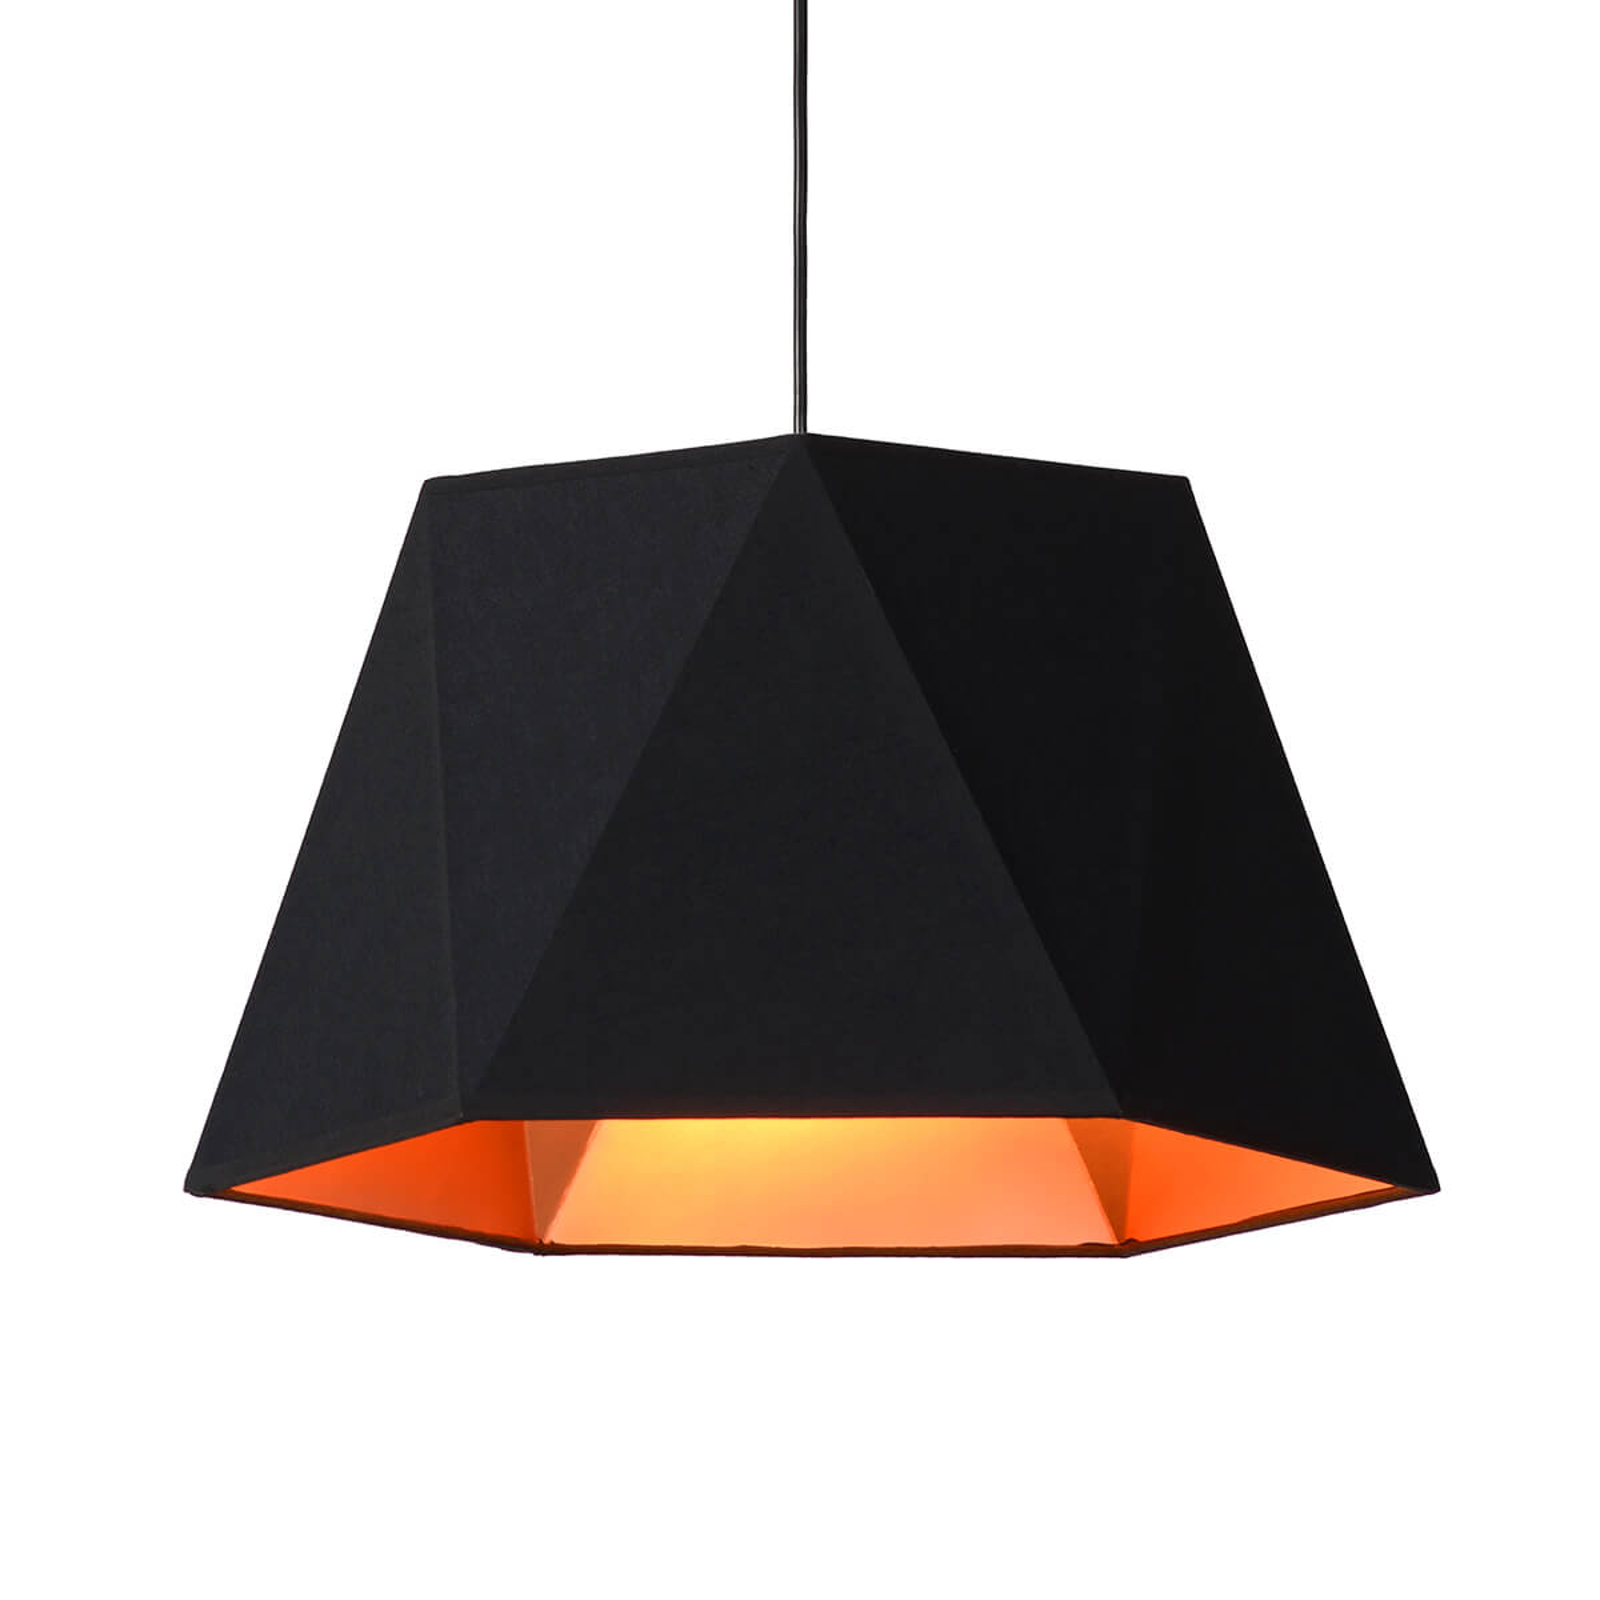 Opvallende hanglamp Alegro in zwart